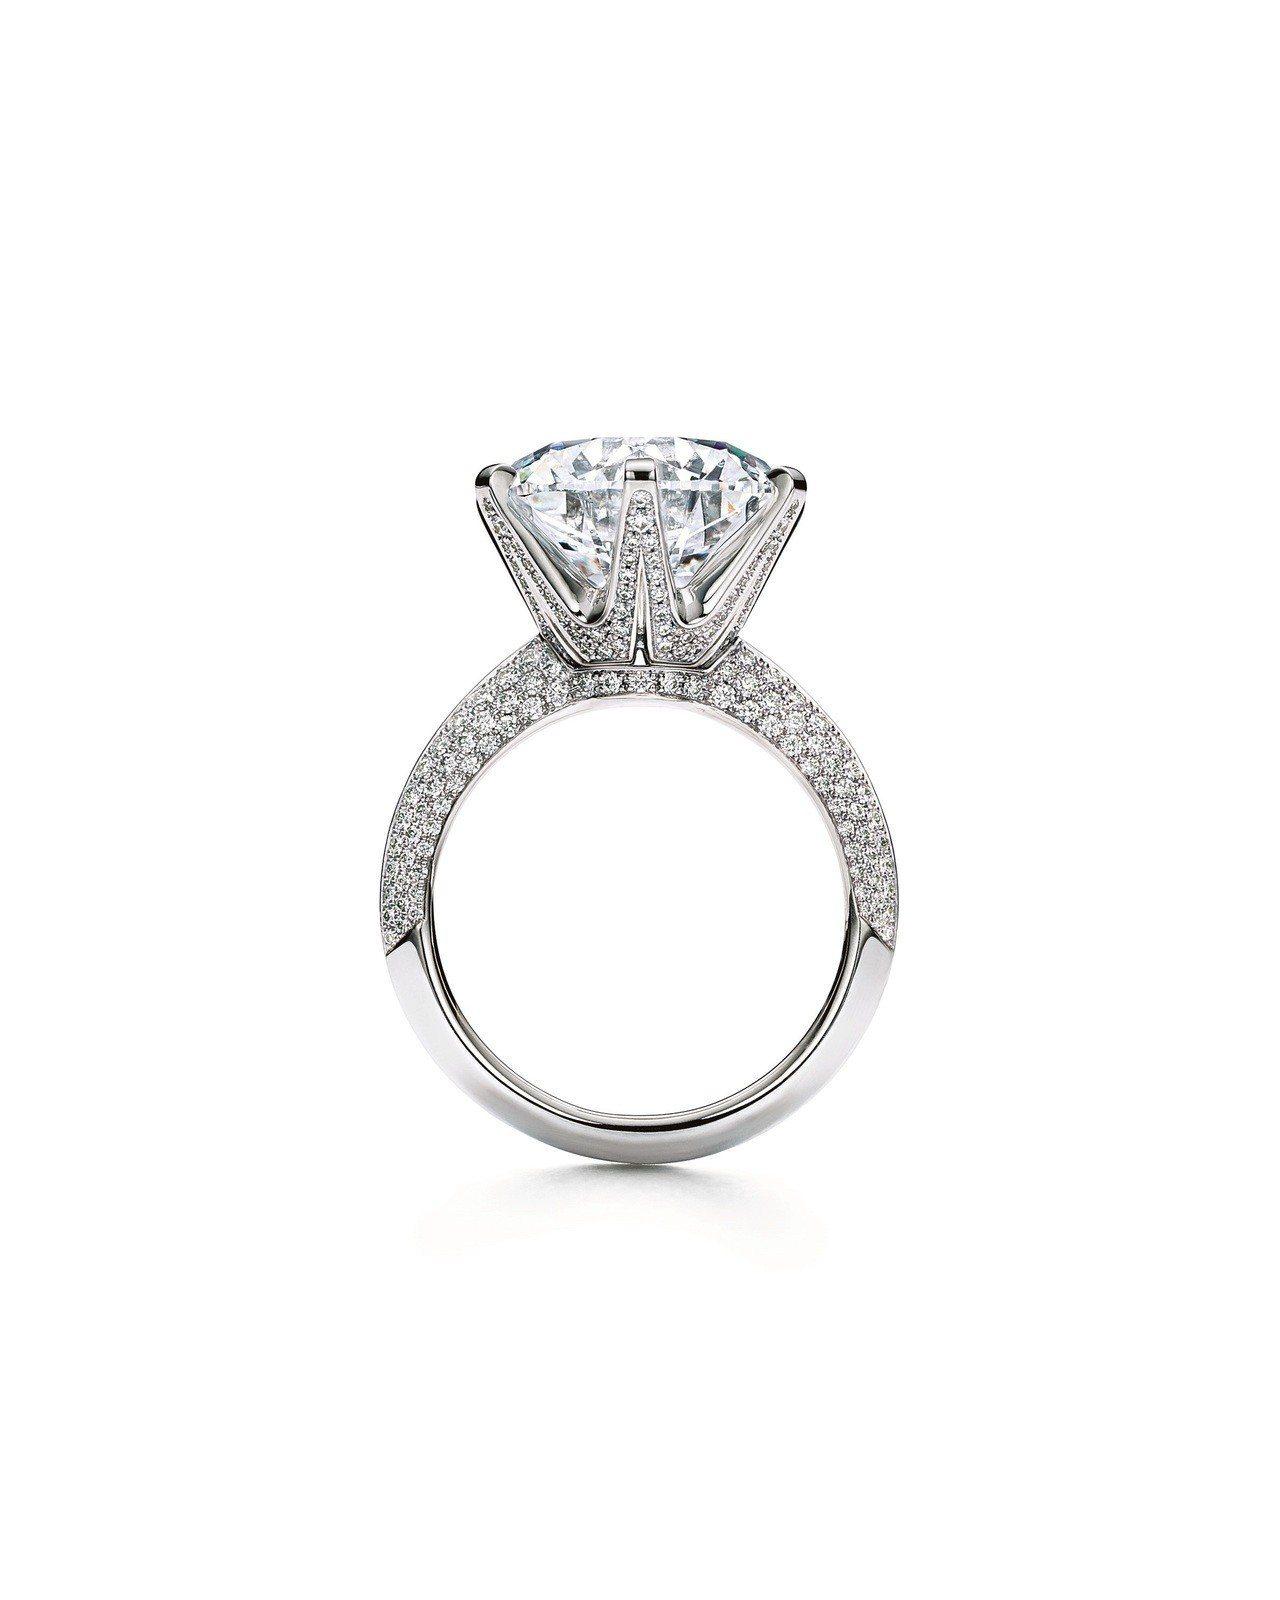 The Tiffany Setting 鉑金鑲嵌8.27克拉鋪鑲鑽石戒指,F,V...